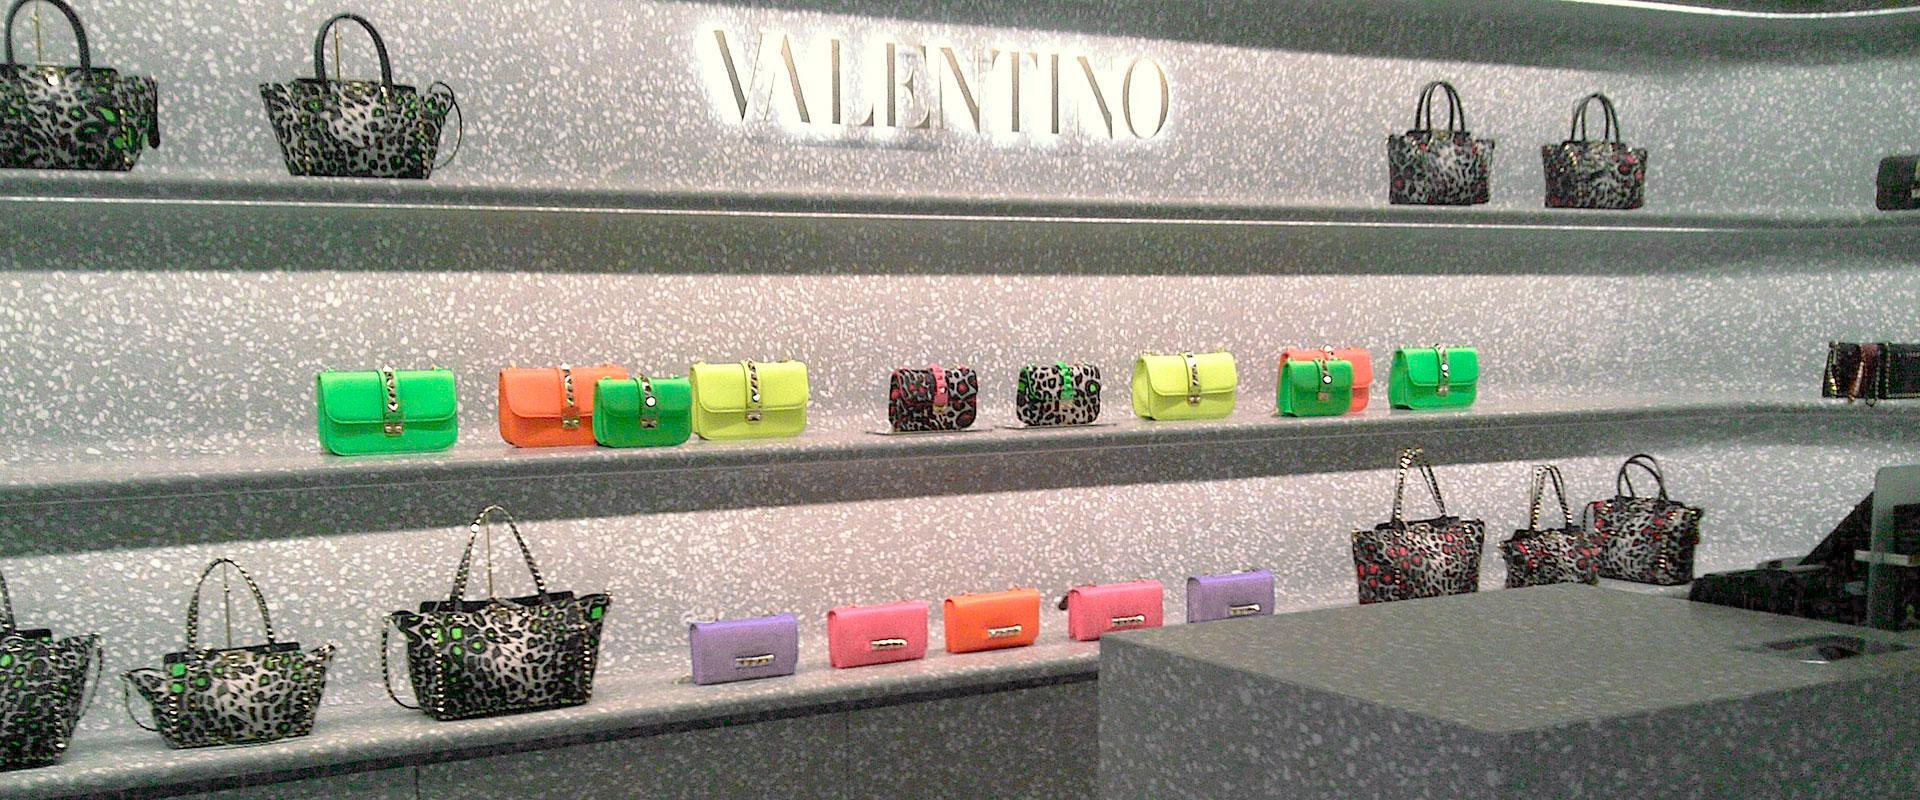 Valentino-harrods-london-united-kingdom-custom-14-OK